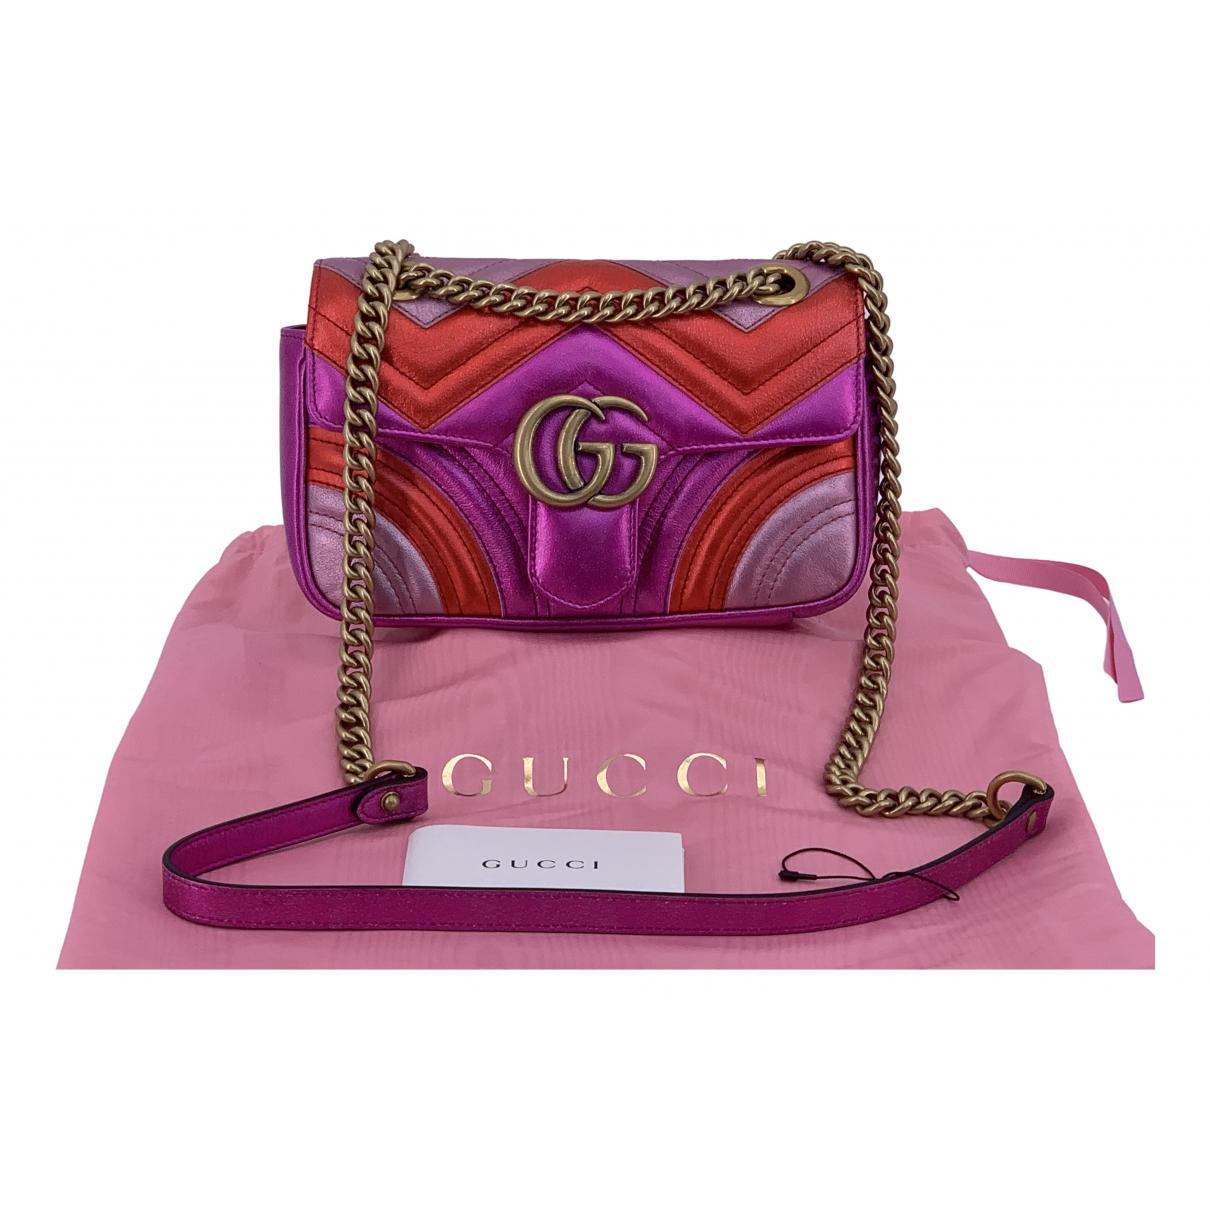 Gucci Marmont Handtasche in  Bunt Leder